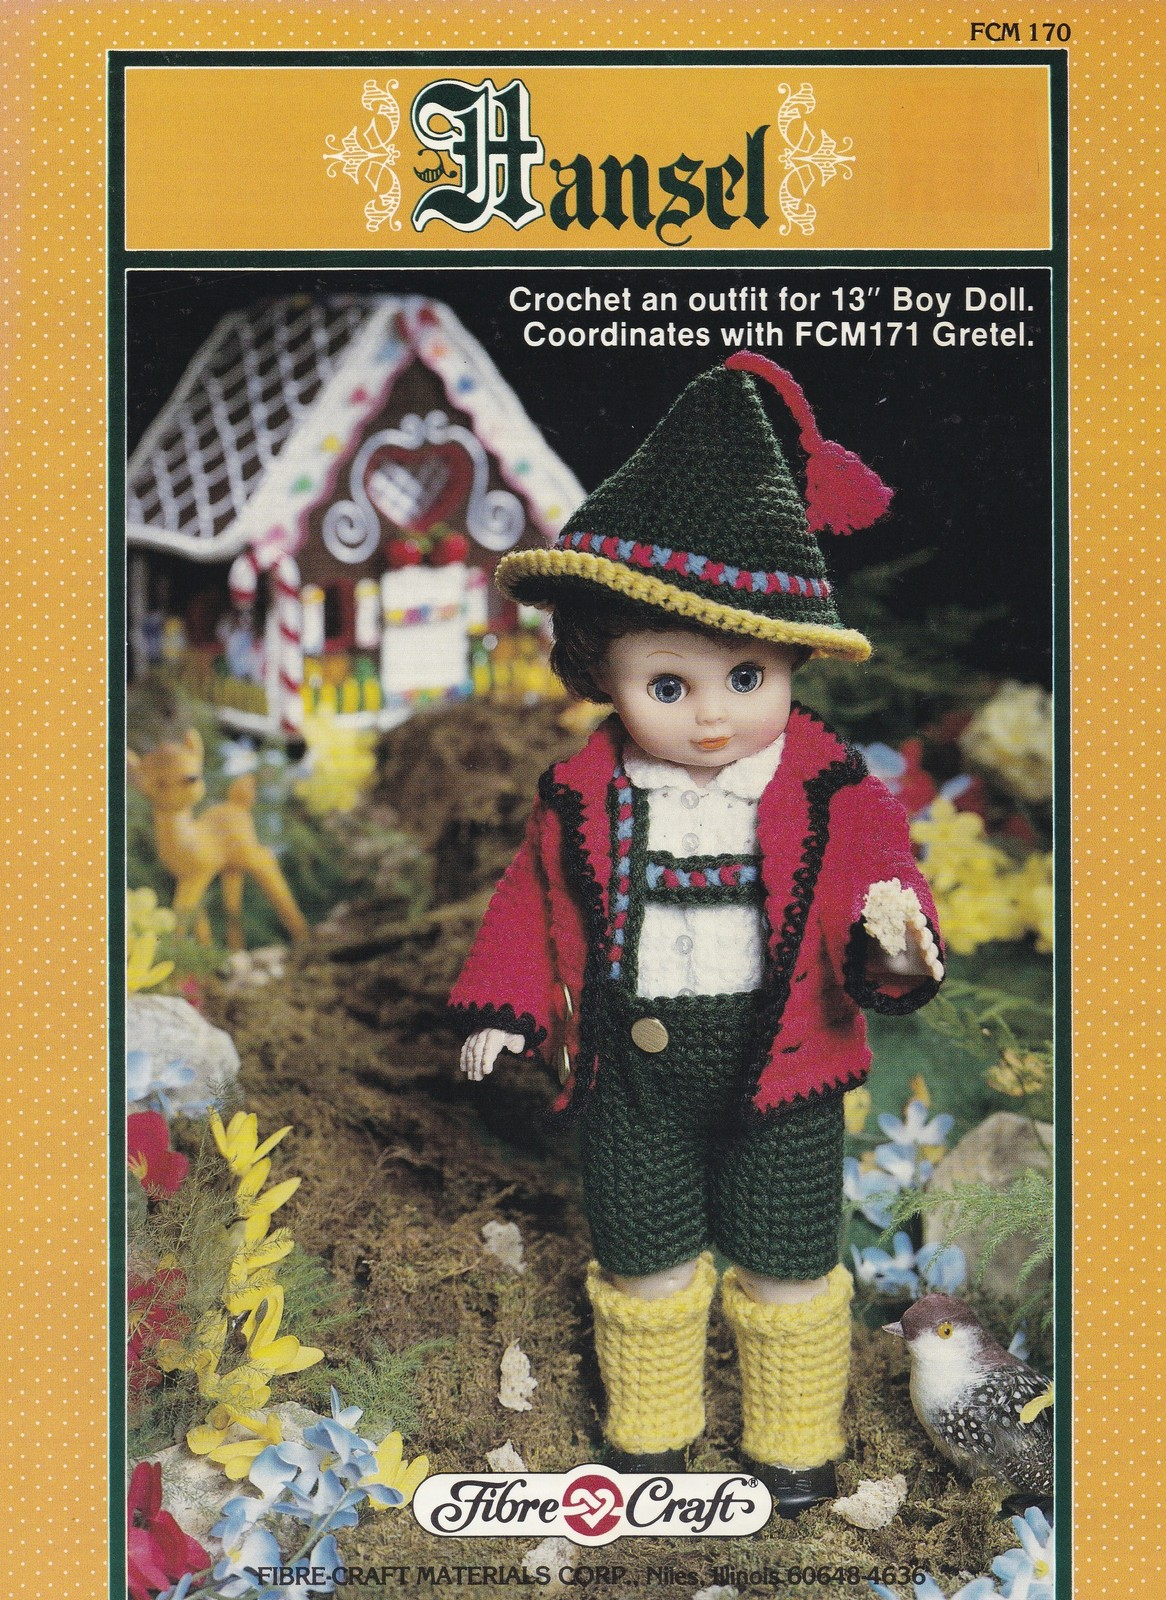 Hansel, Fibre Craft 13 inch Male Doll Clothes Crochet Pattern Booklet FCM170